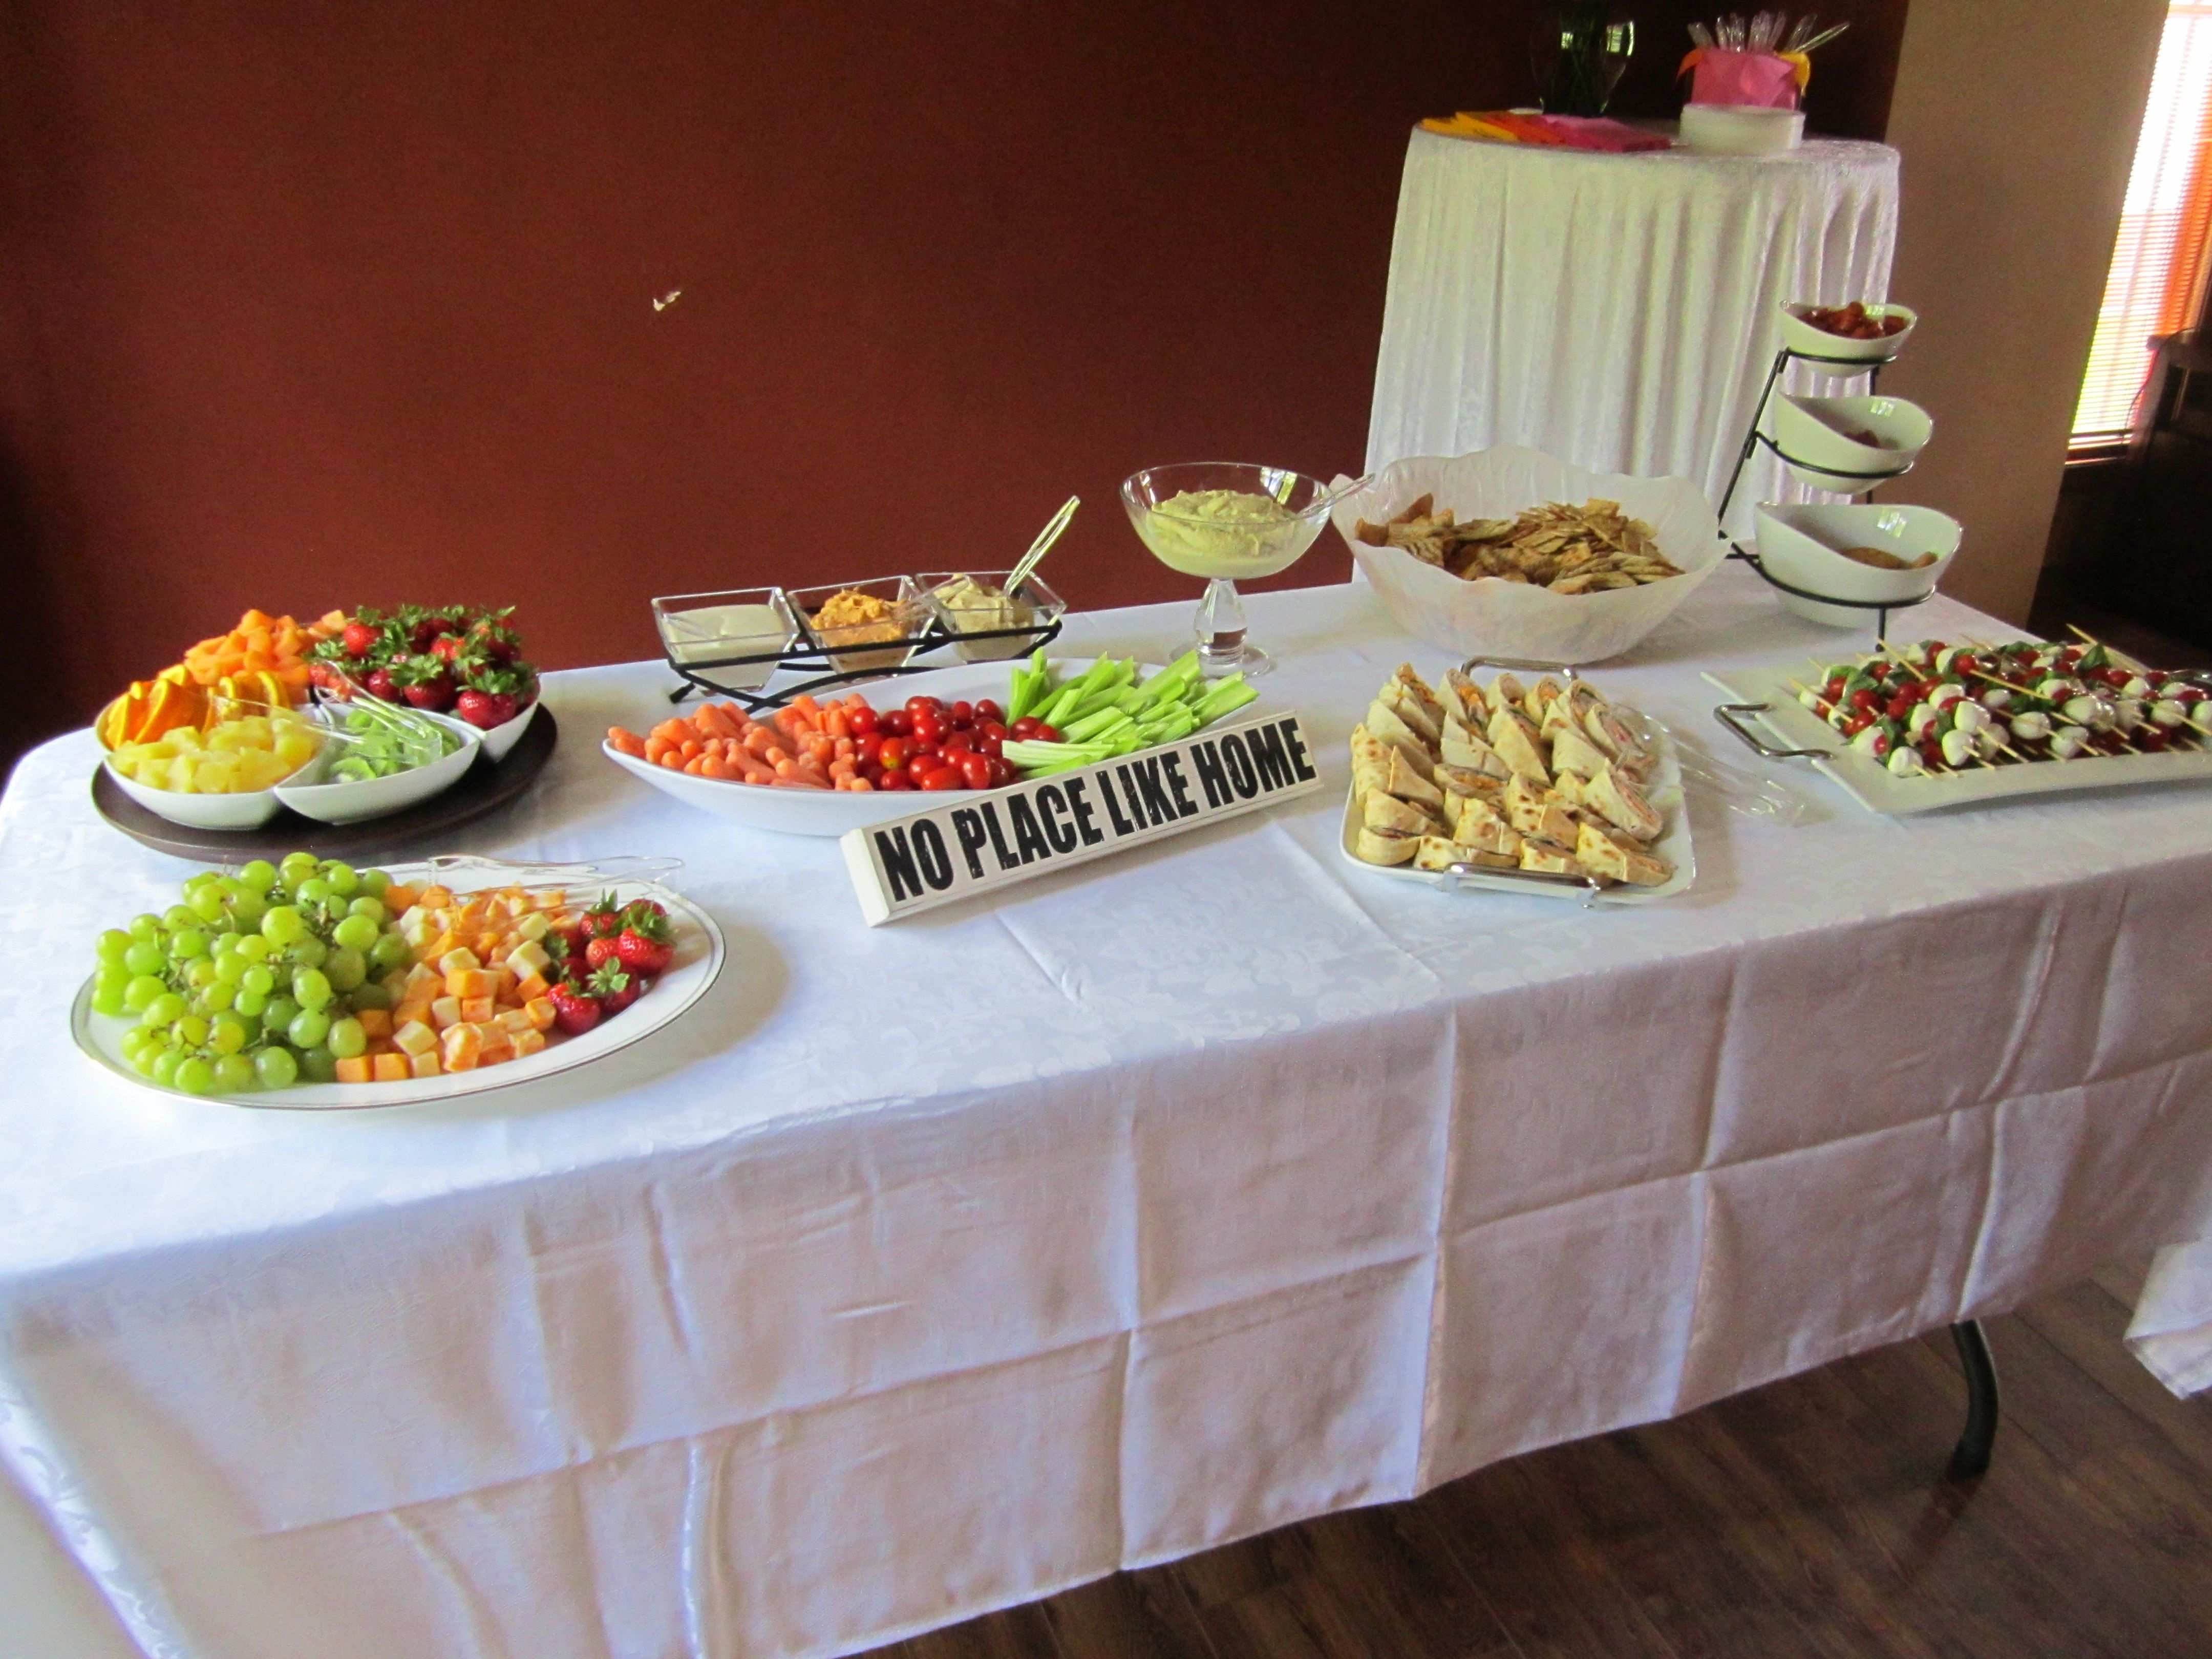 Housewarming party buffet table. | Housewarming Party ...